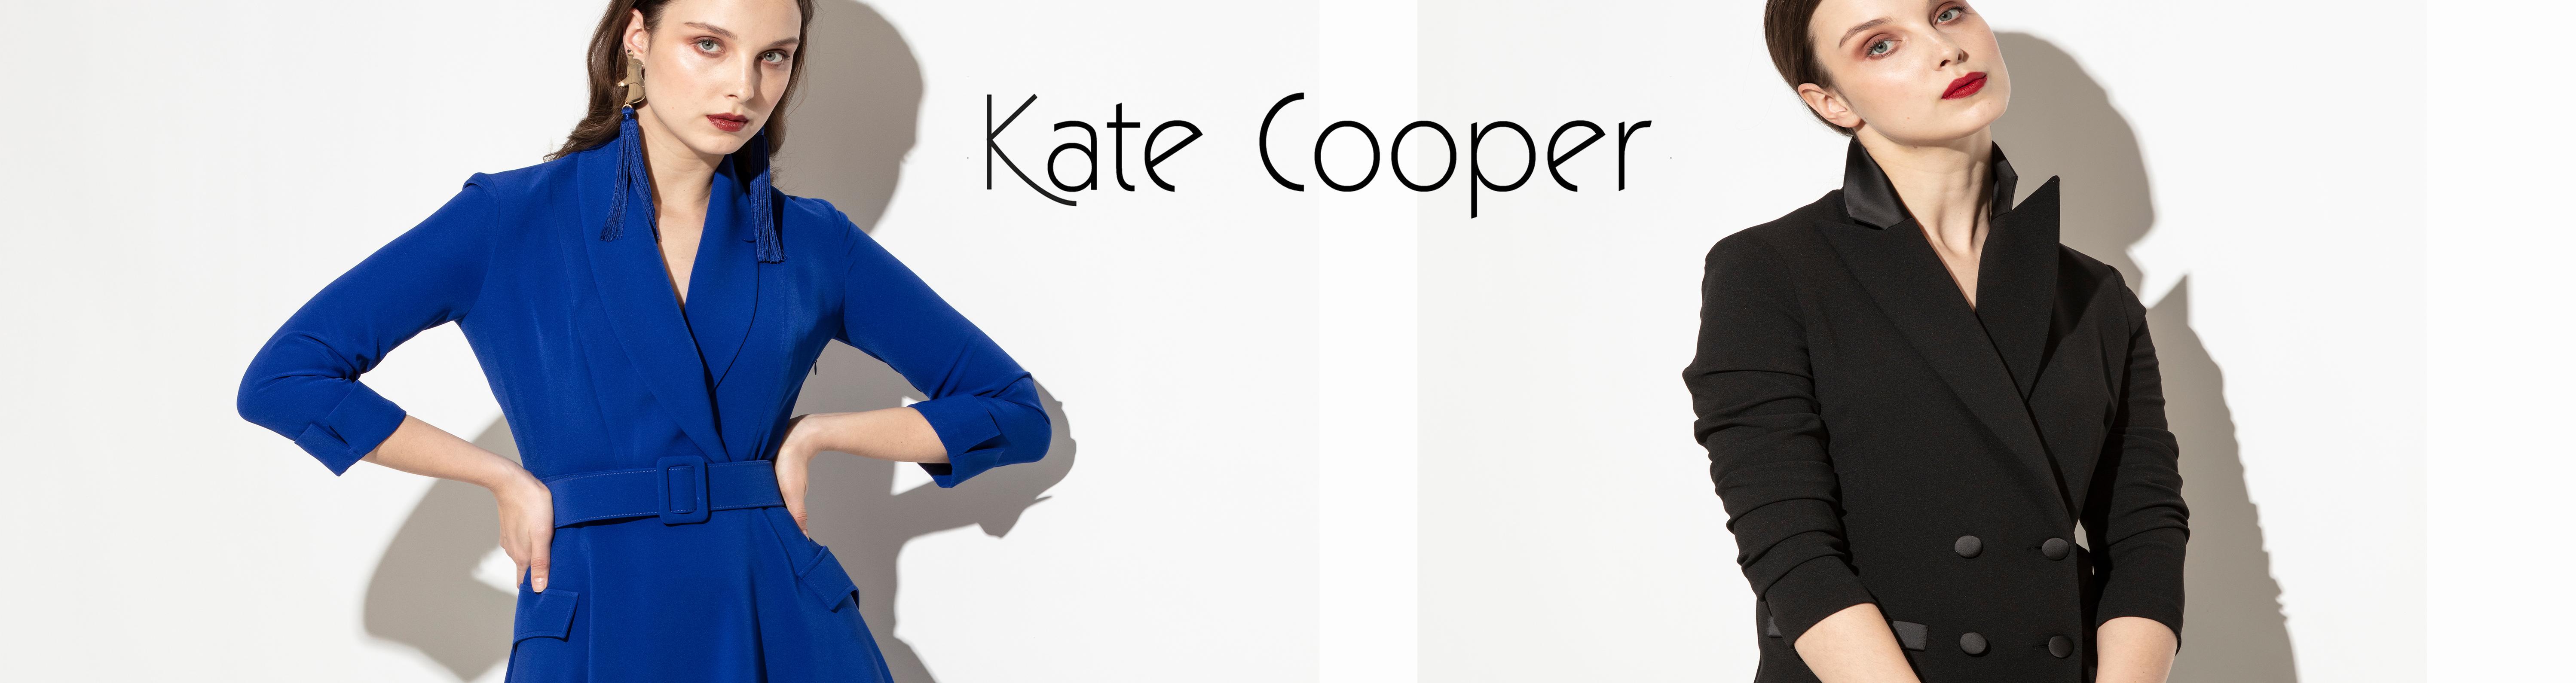 kate-header.jpg